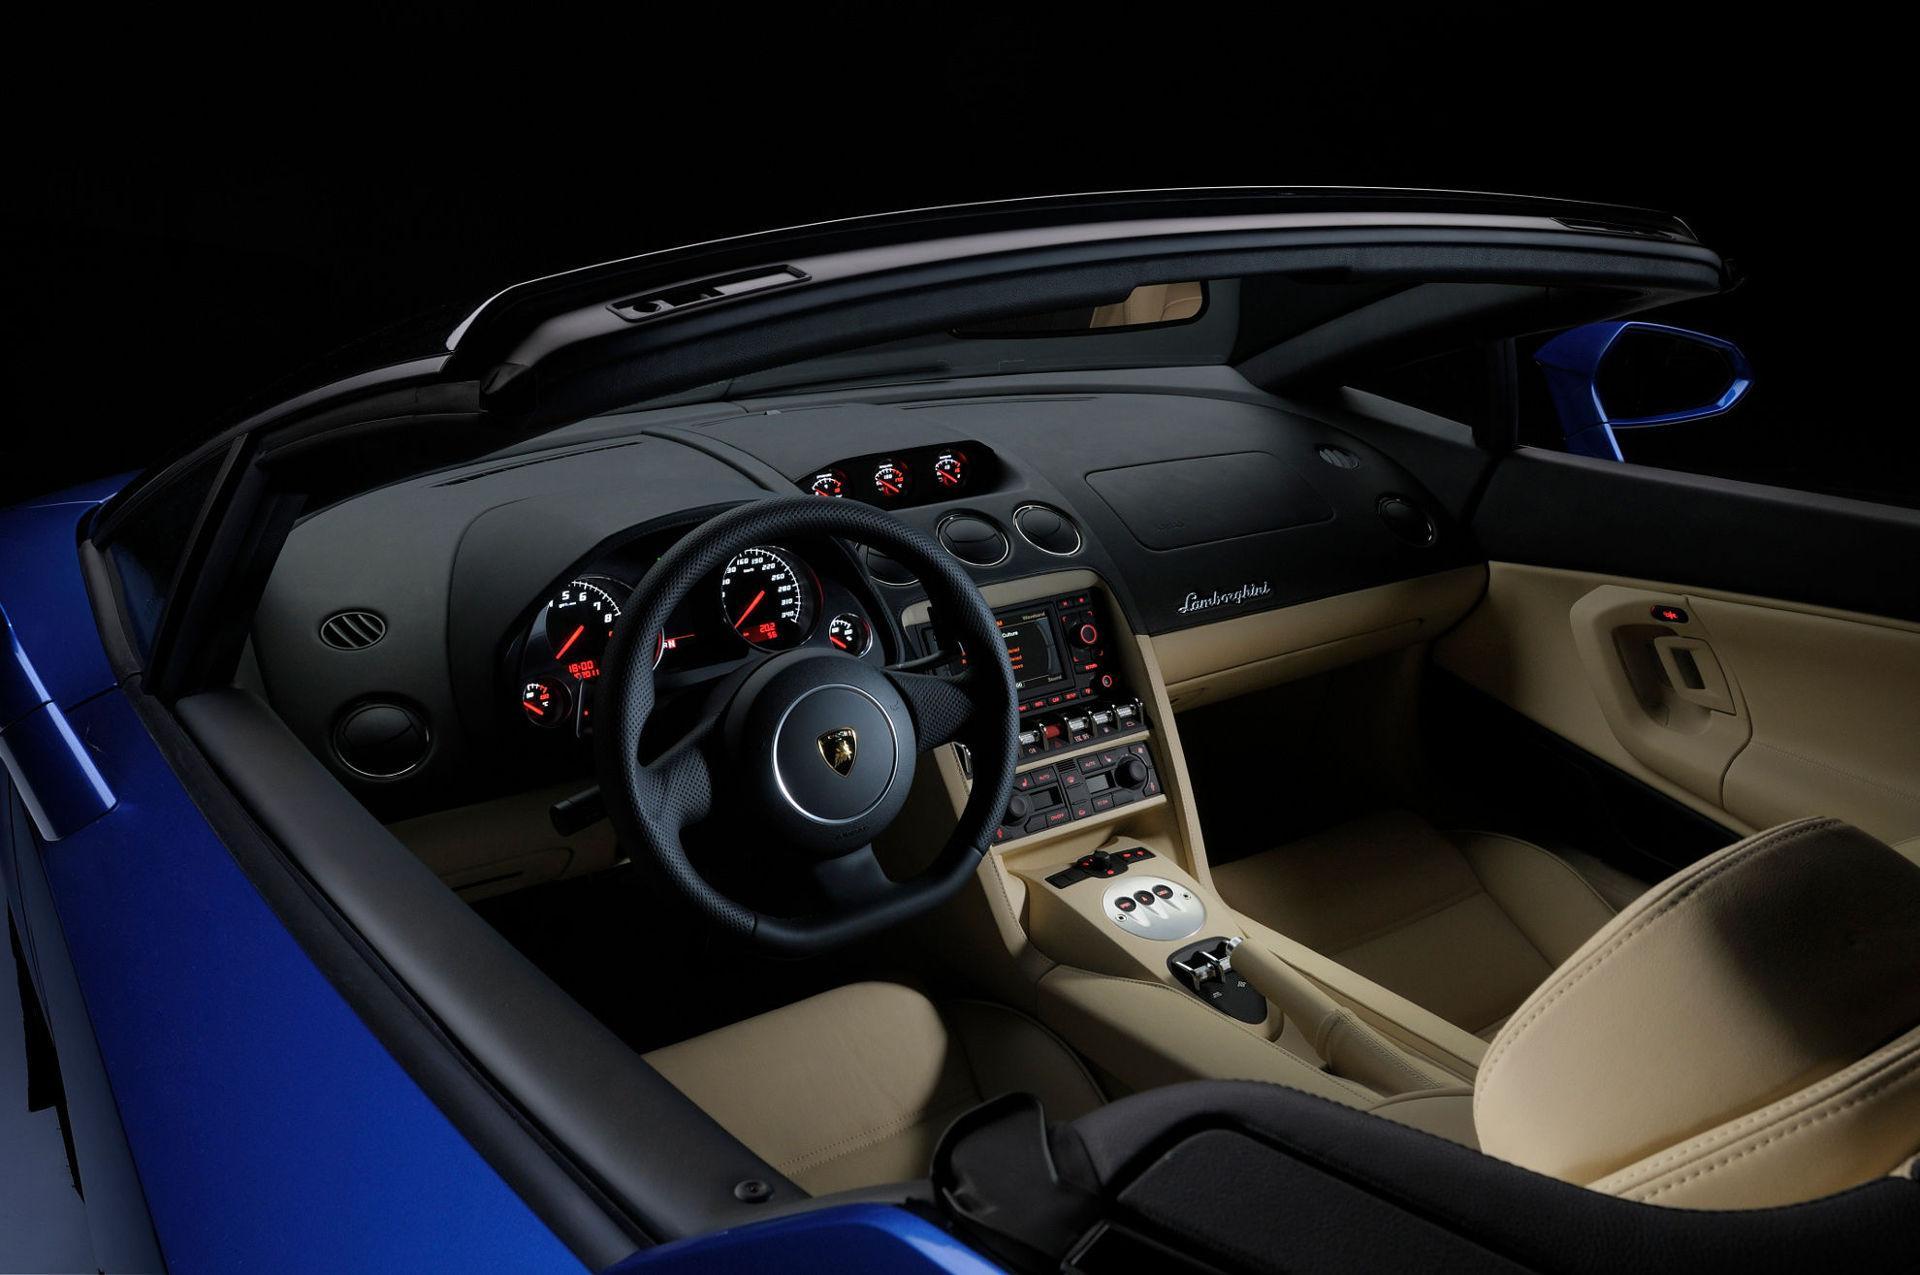 Lamborghini Gallardo LP 550-2 Spyder - Innenraum